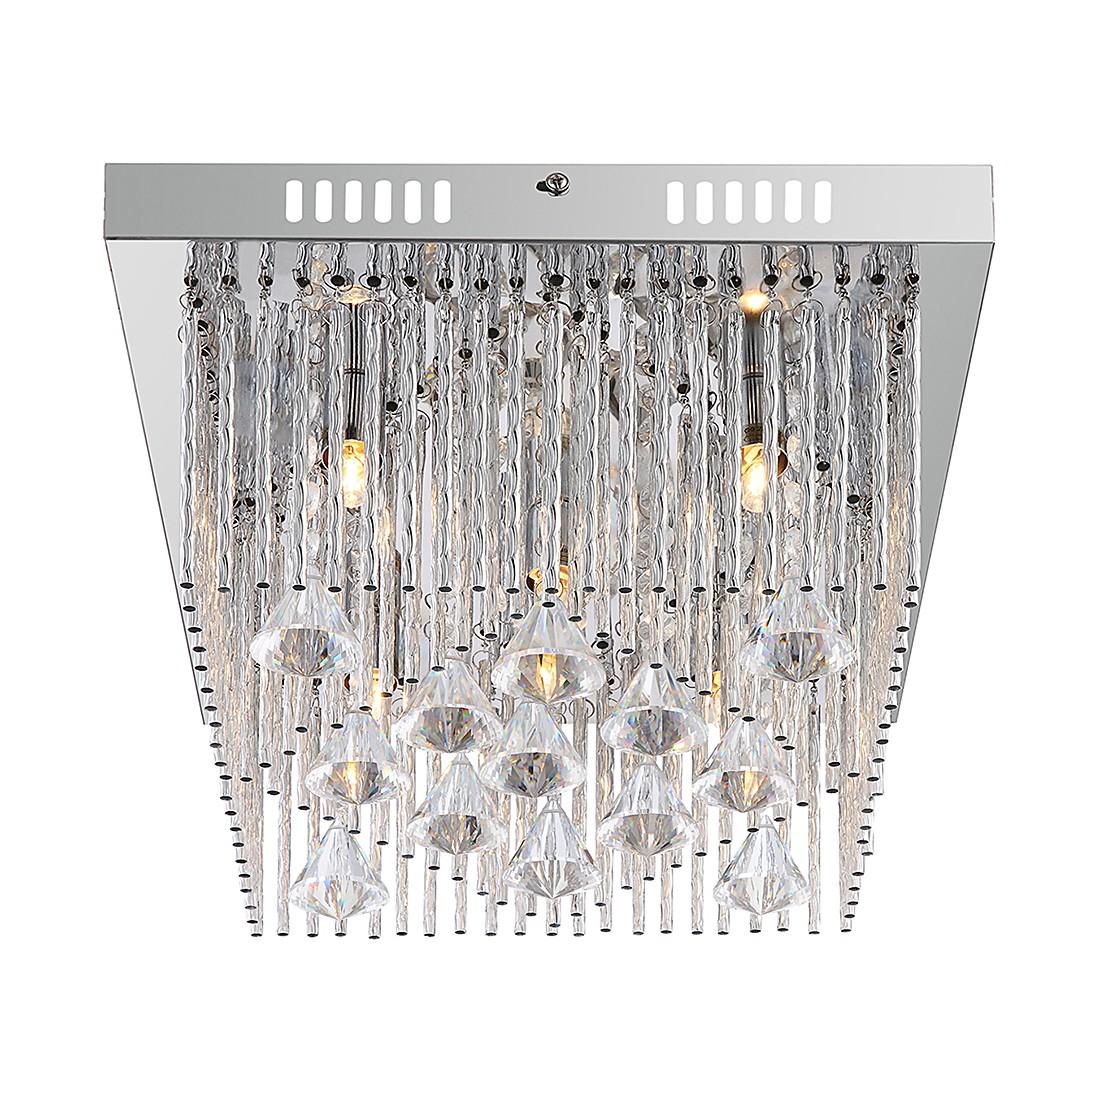 Deckenleuchte MARABOU – Metall – Silber – 5-flammig, Globo Lighting günstig